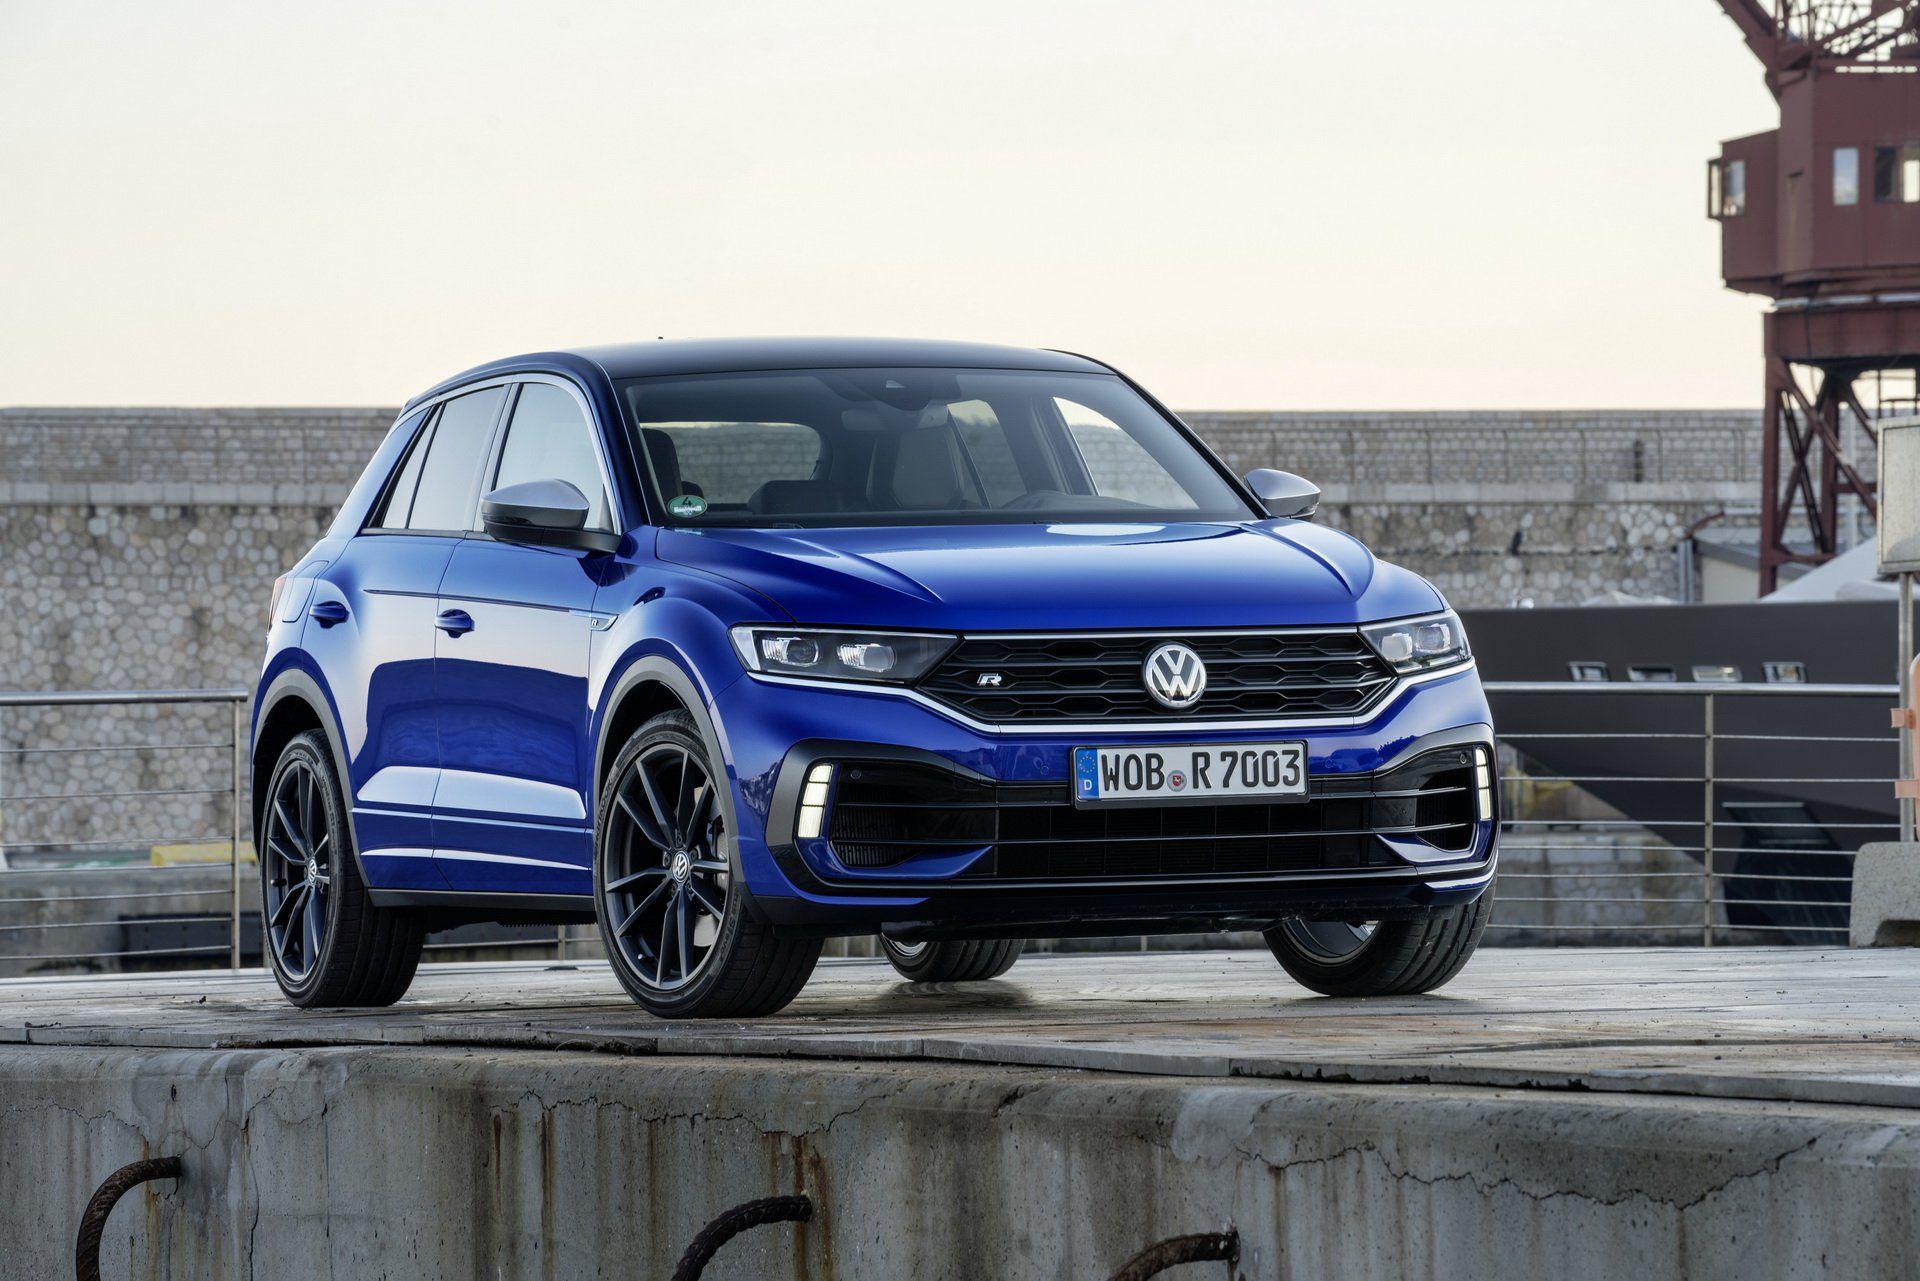 New Vw T Roc R Wants To Become The Default Hot Hatch On Stilts Volkswagen Hot Hatch Car Volkswagen